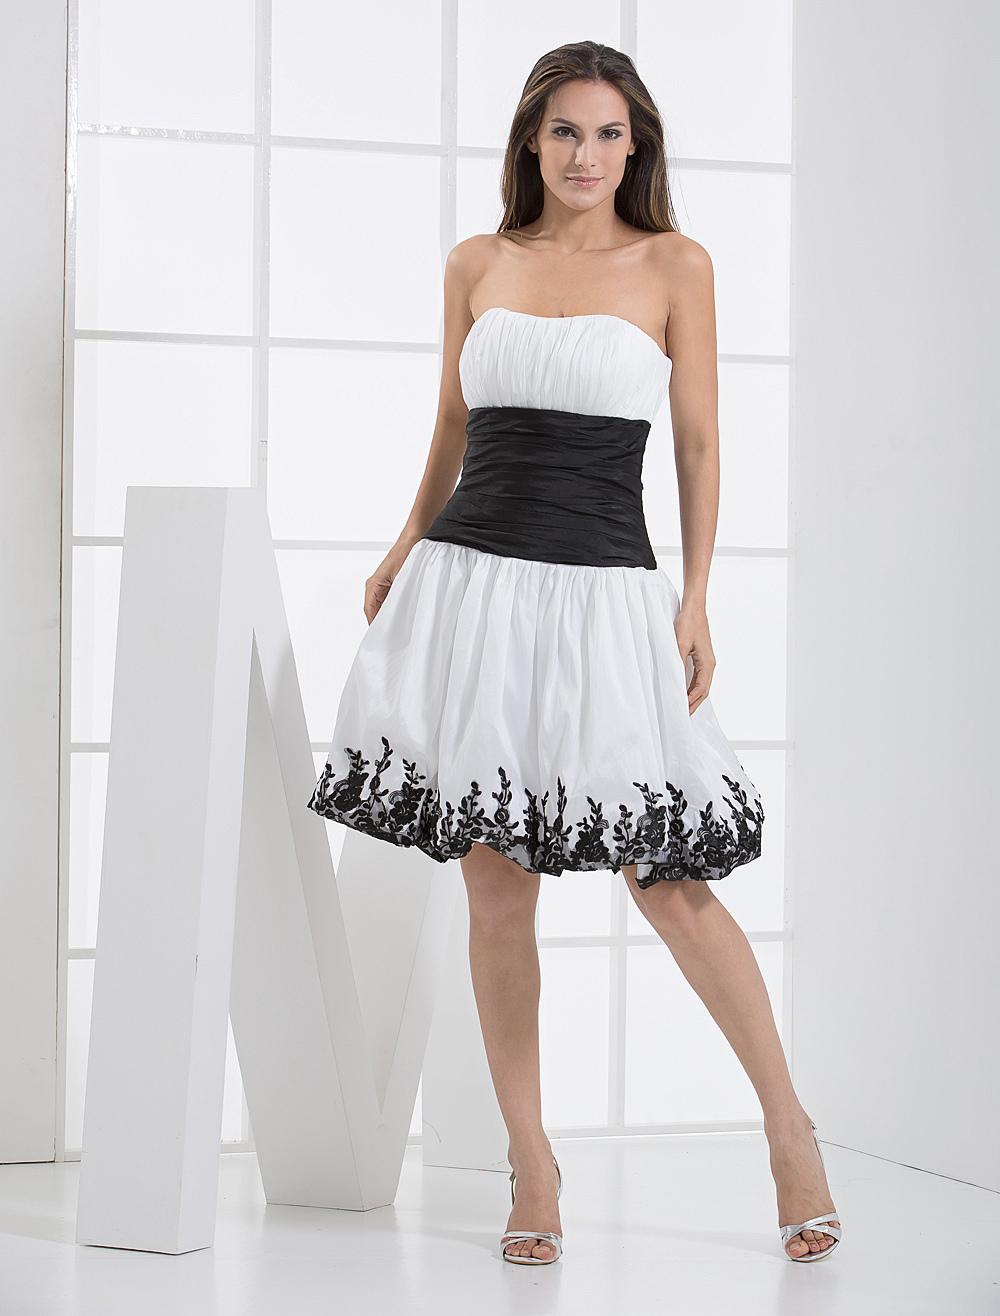 Strapless Sash Applique Taffeta Summer Cocktail Homecoming Prom Dress